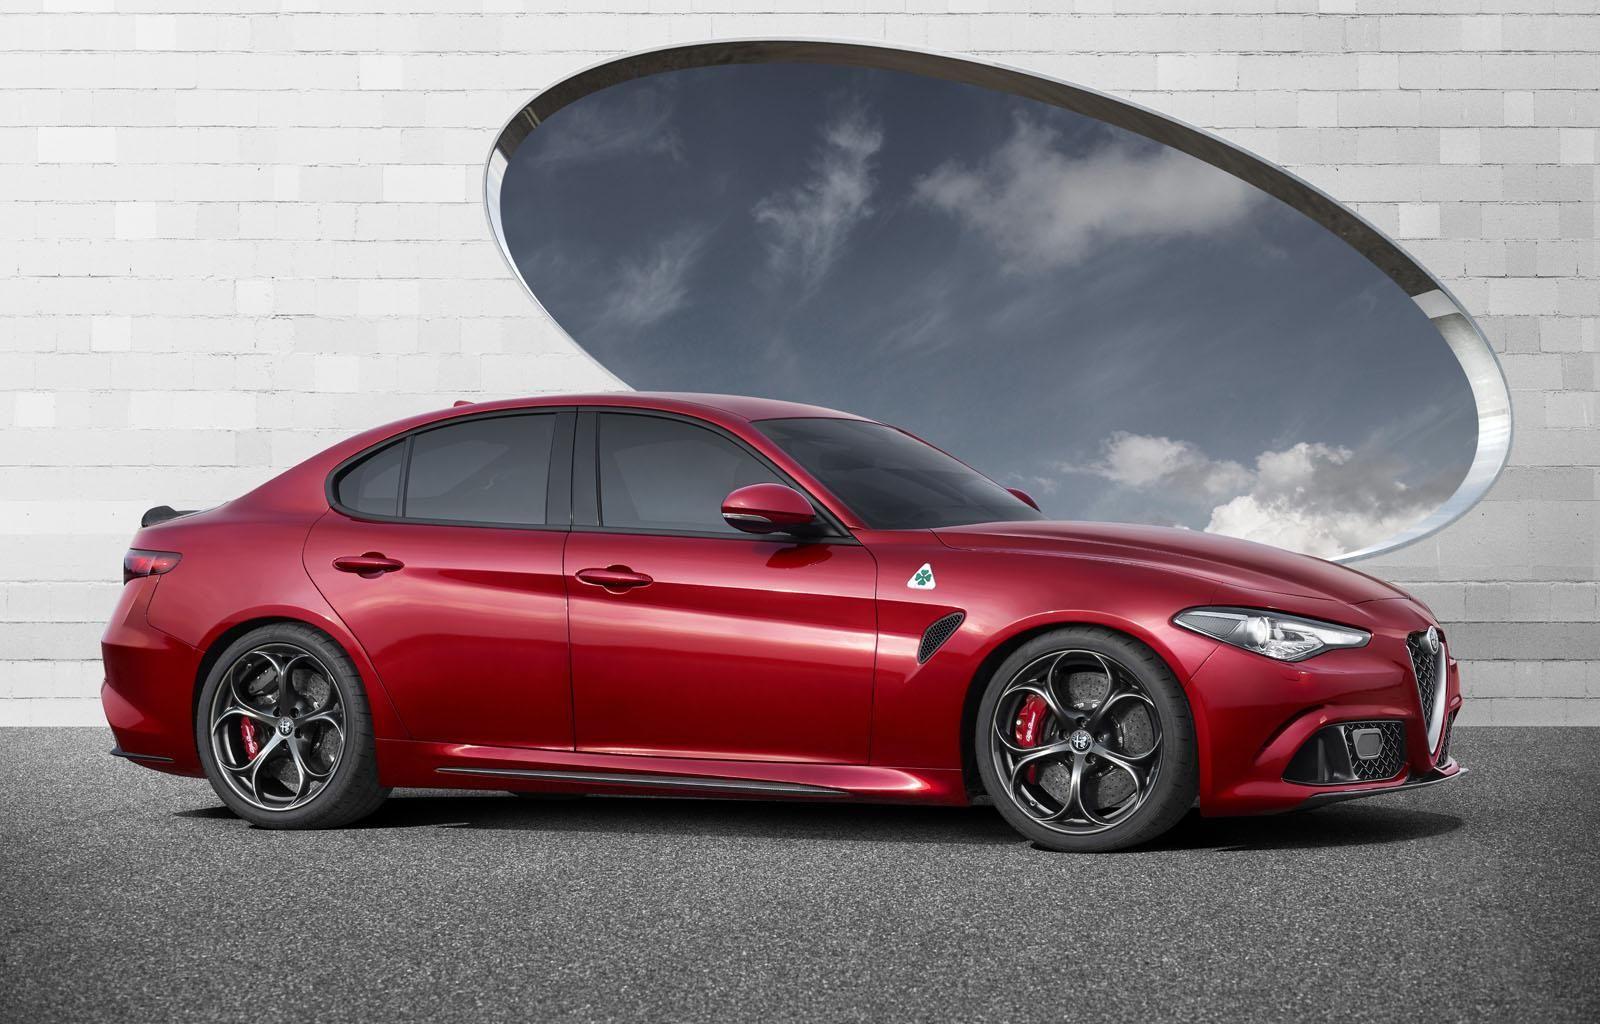 Alfa Romeo Giulia Officially Unveiled Alfa Romeo Motores Autos